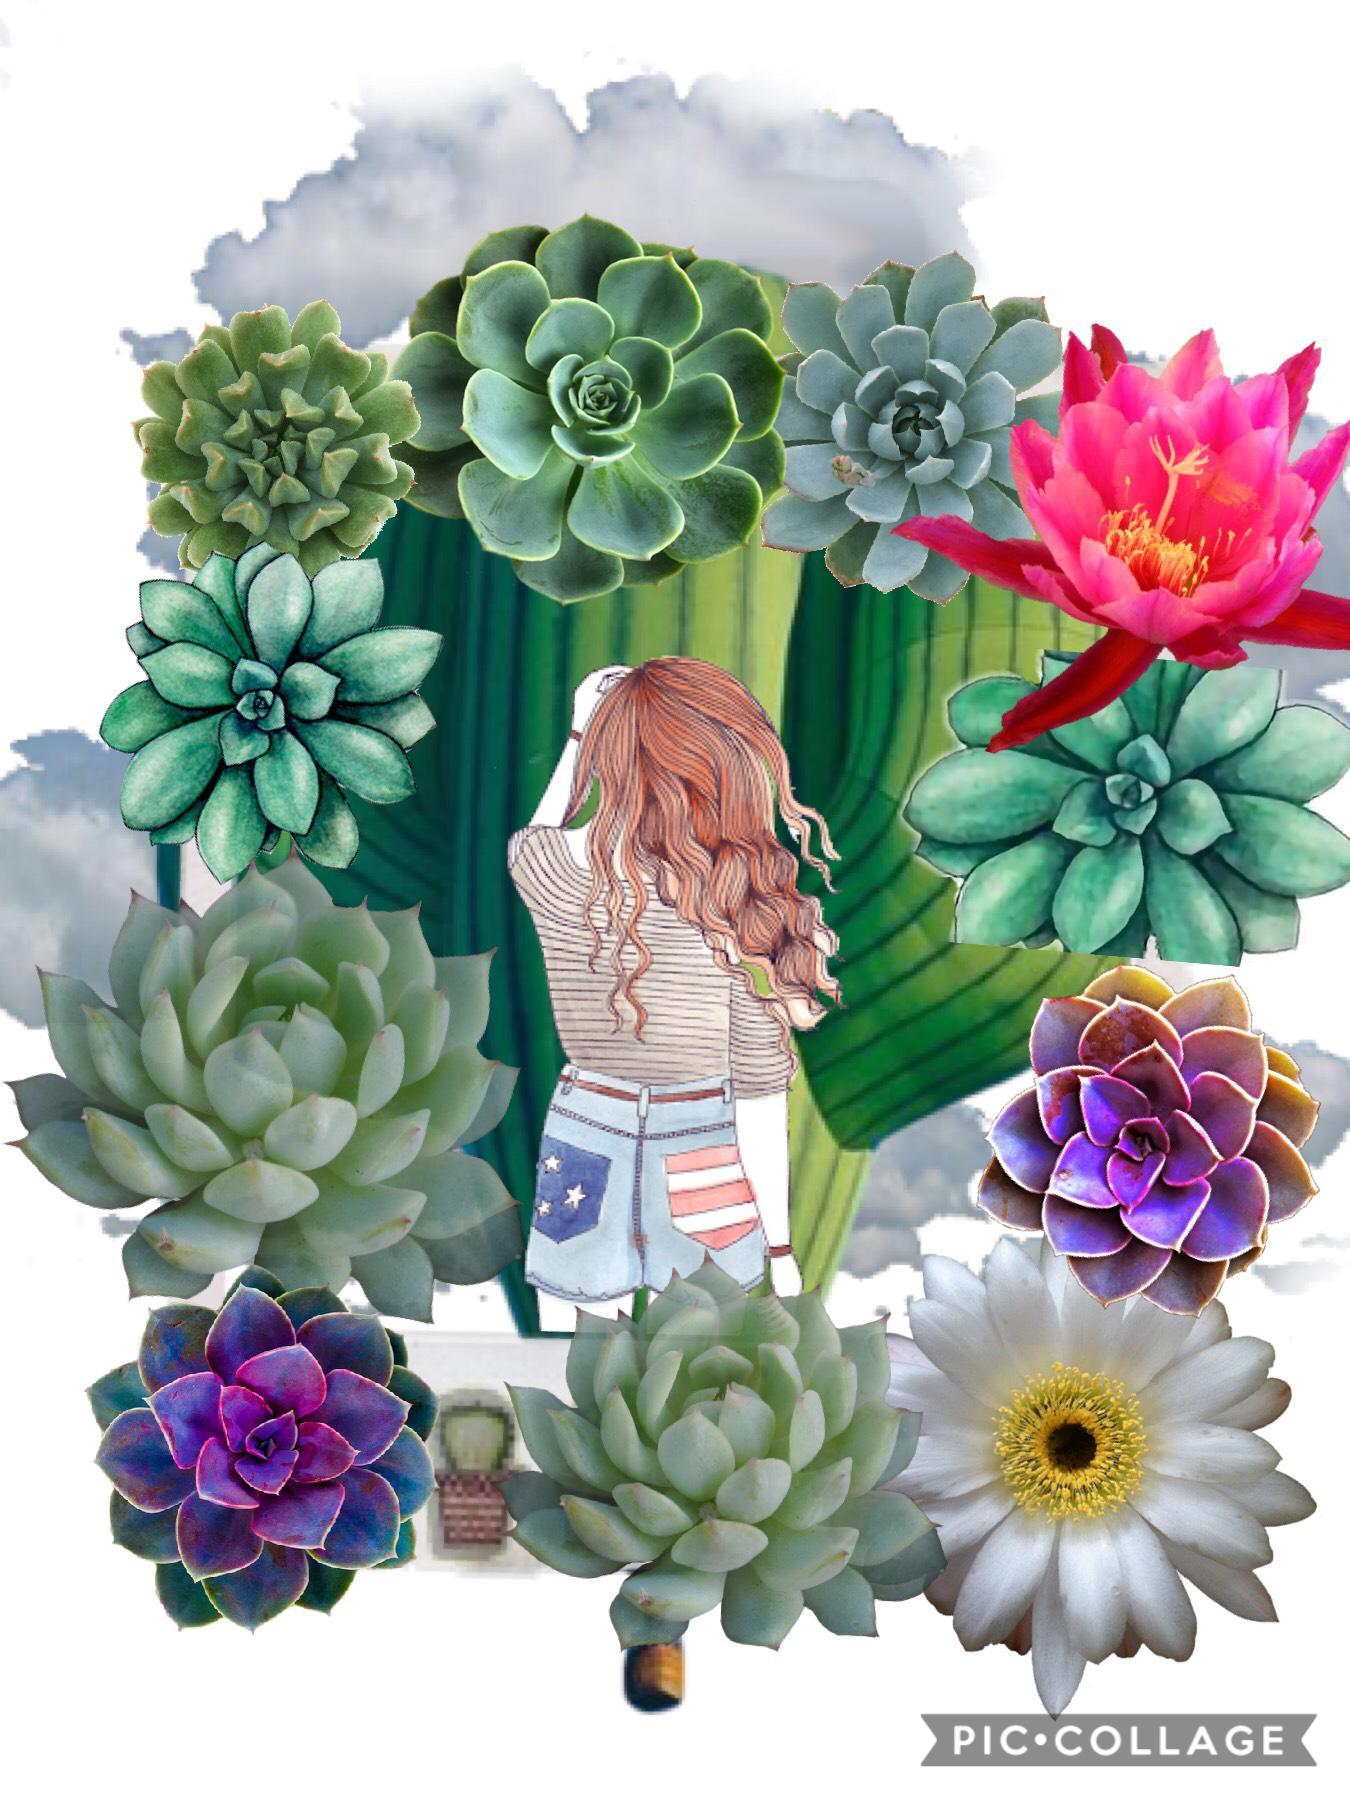 Tap   Cactus flower girl ❤️❤️❤️❤️ love the open world 🌎